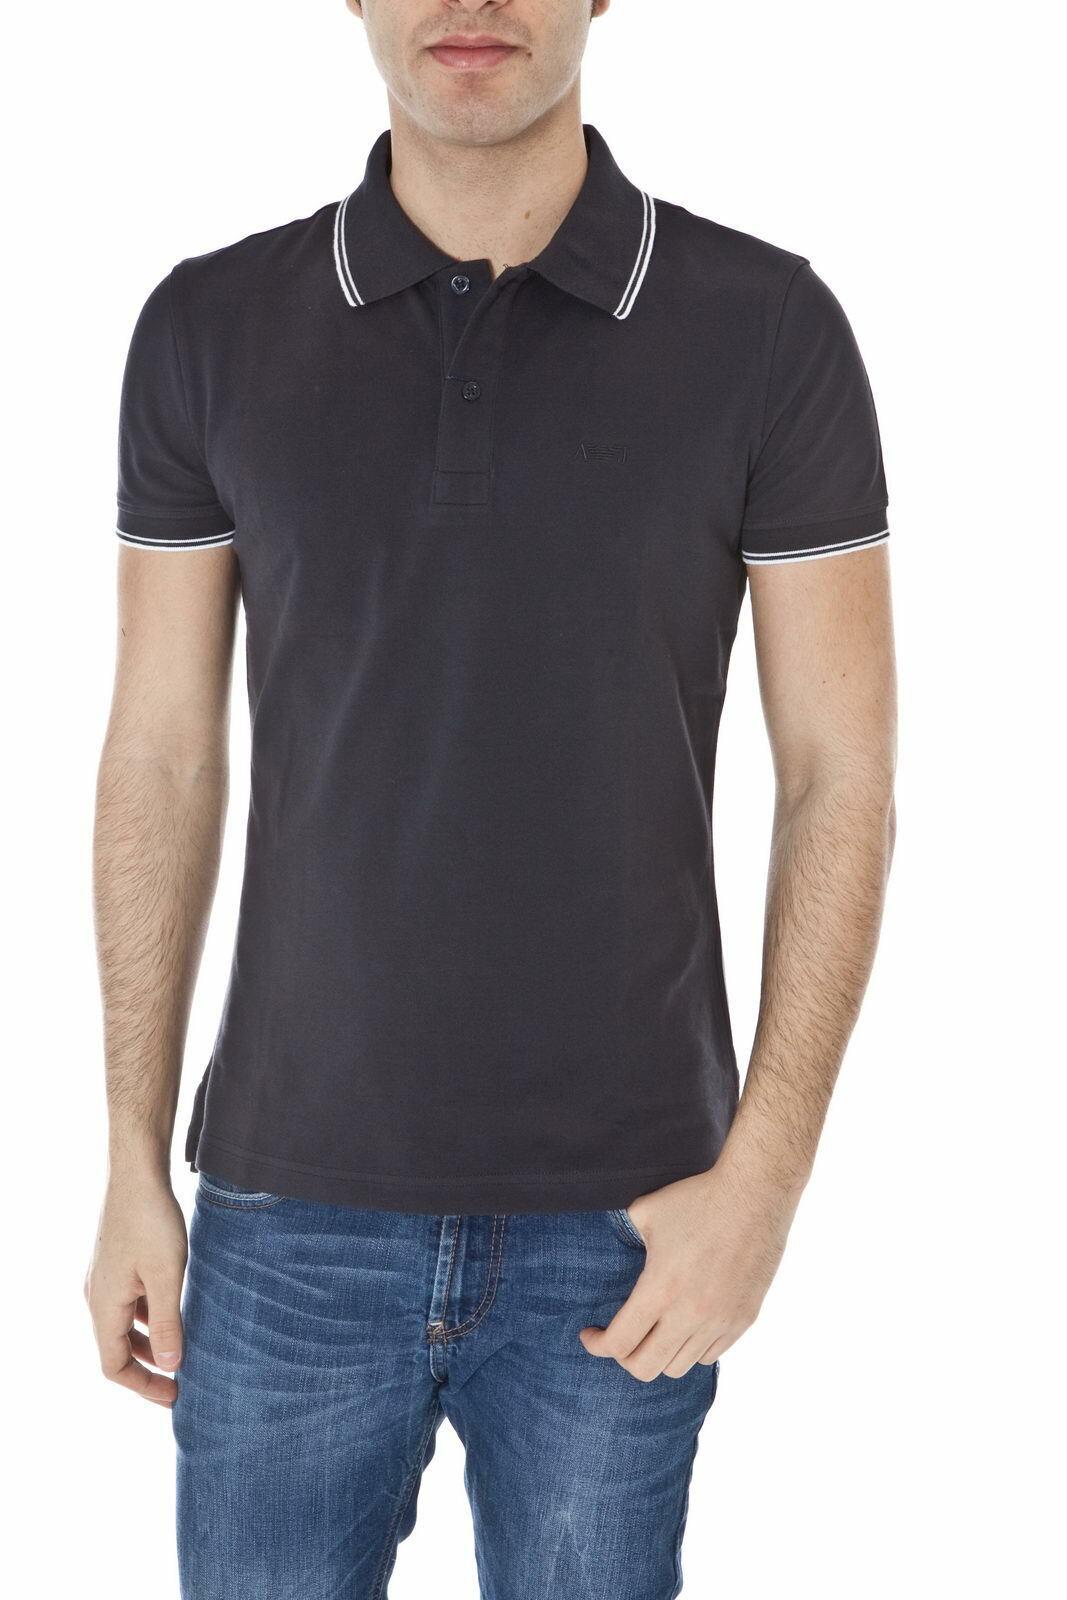 Armani Jeans AJ Polo hemd baumwolle Man Blau 06M30BT 95 Sz L MAKE OFFER